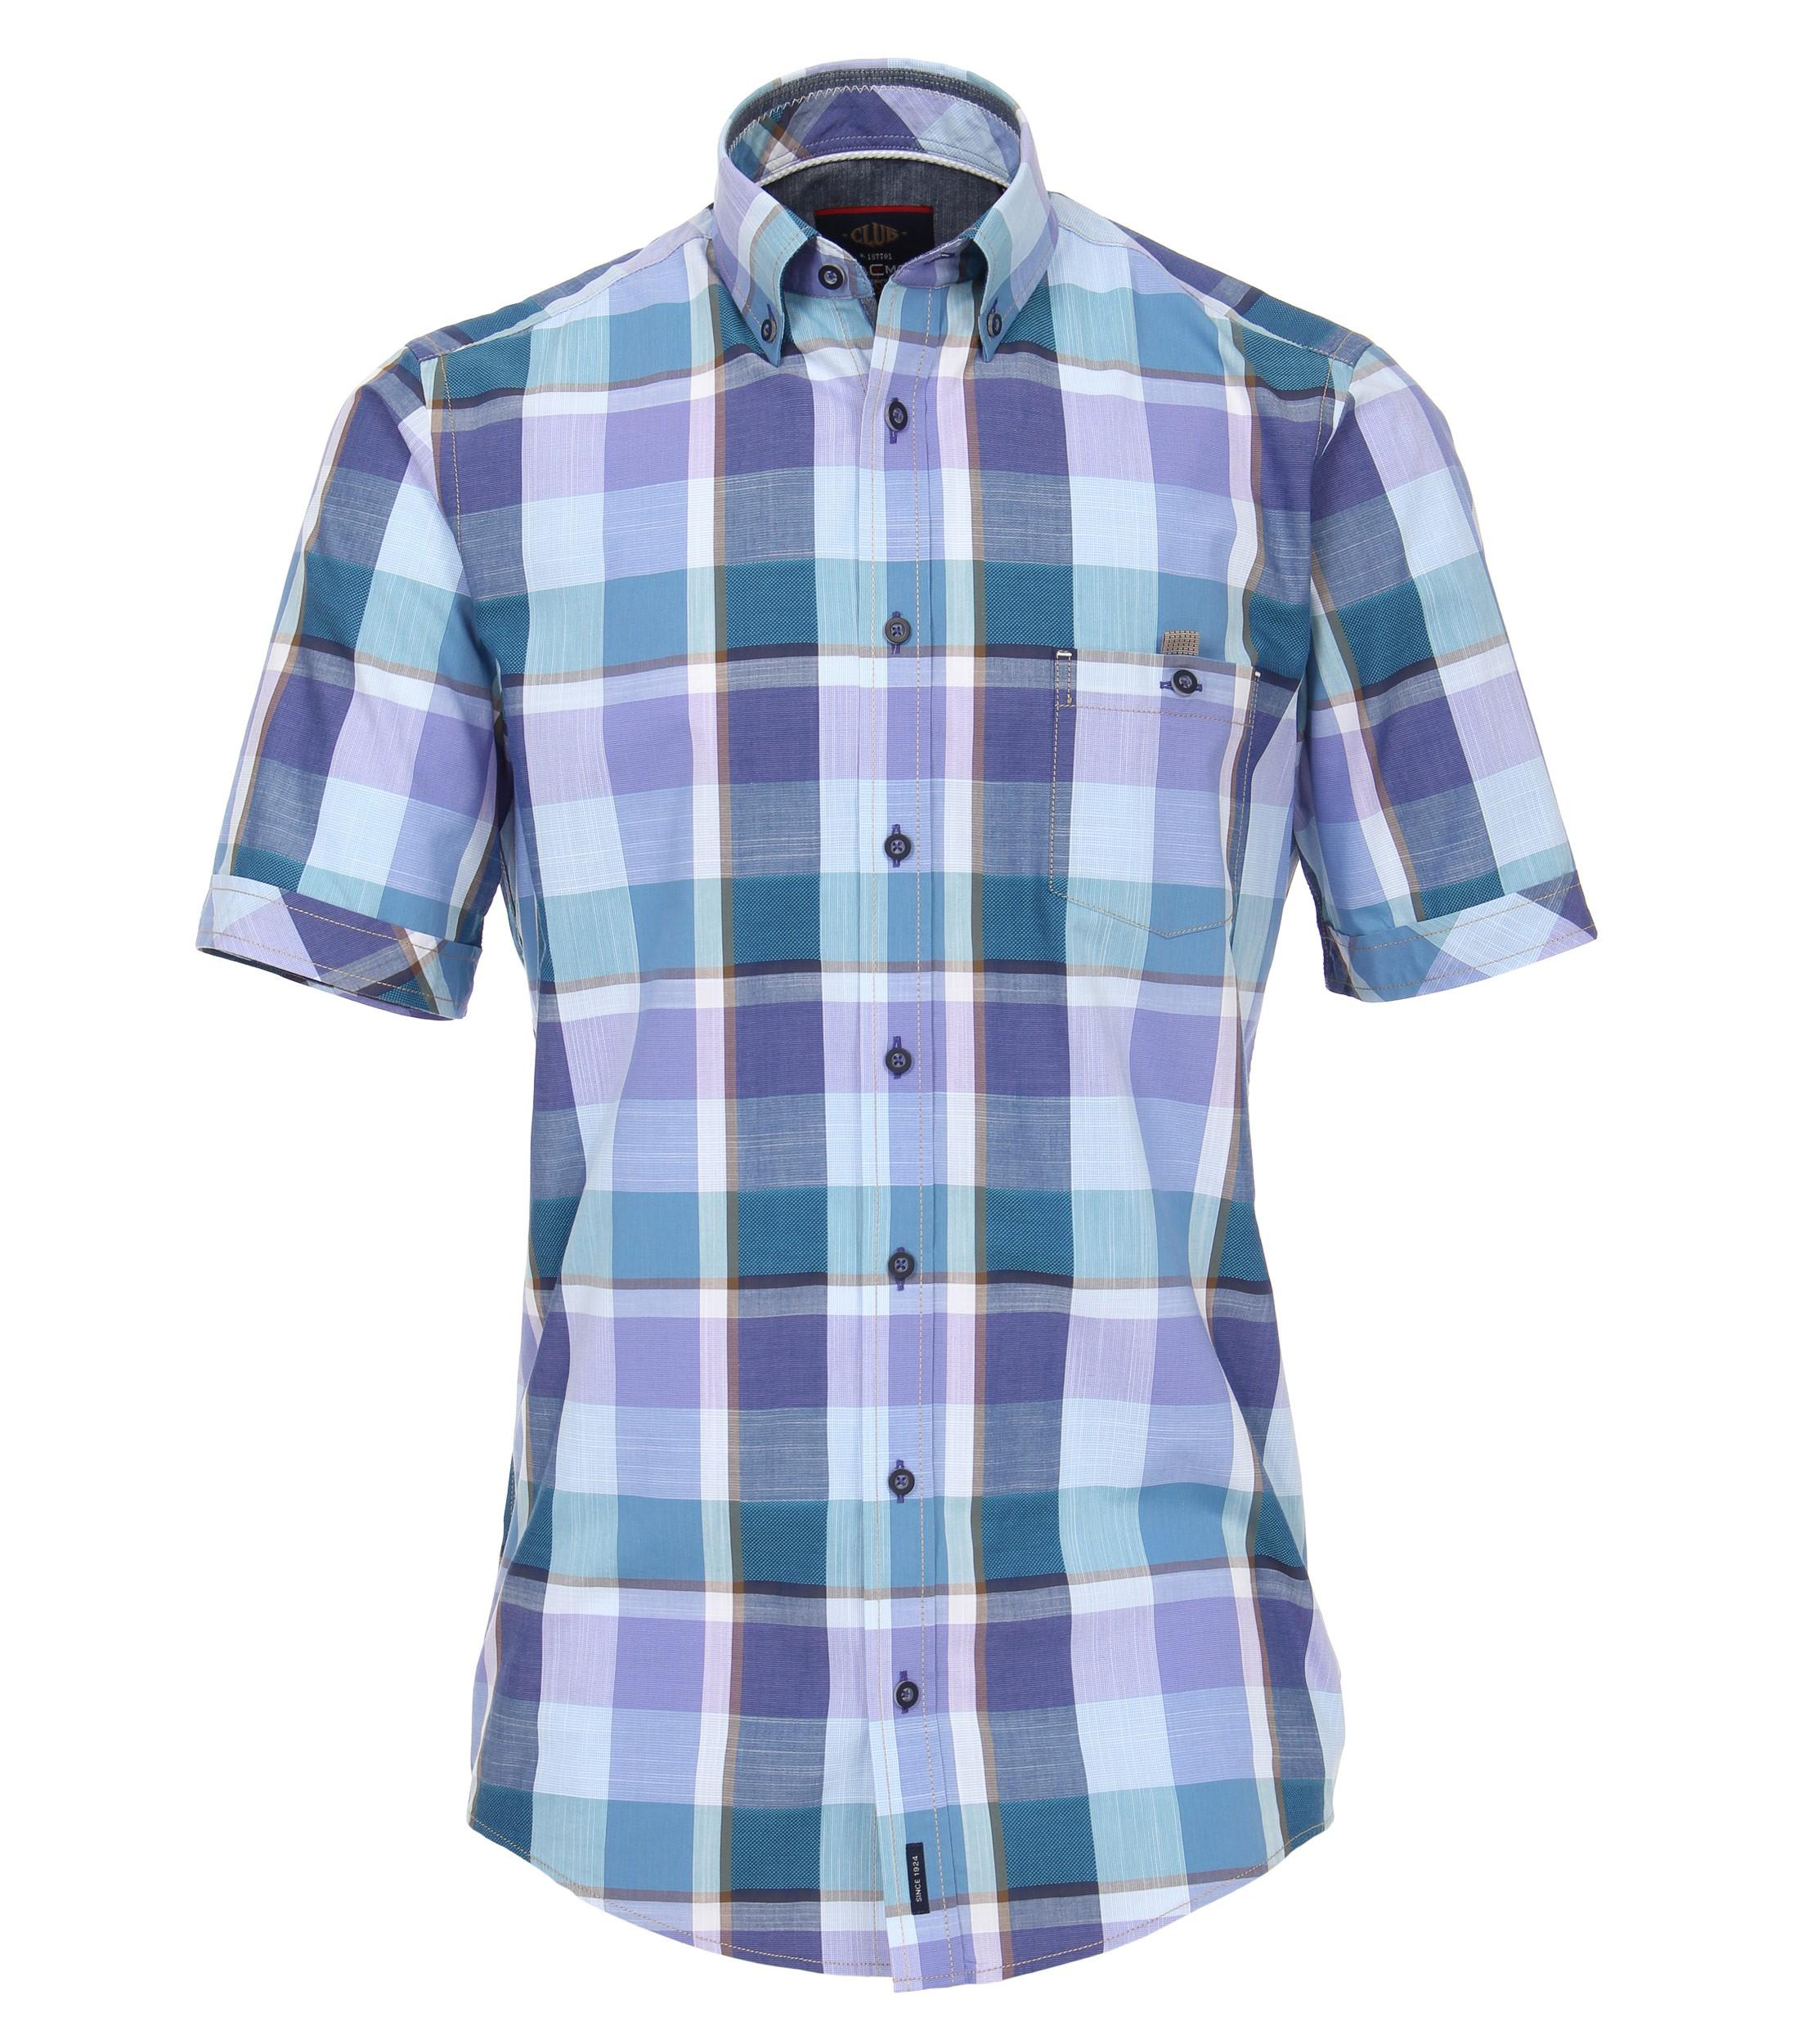 Casa Melvinsi 2xl Moda Bestel Bij 7xlGroen Overhemd Nu dCoWBrxe